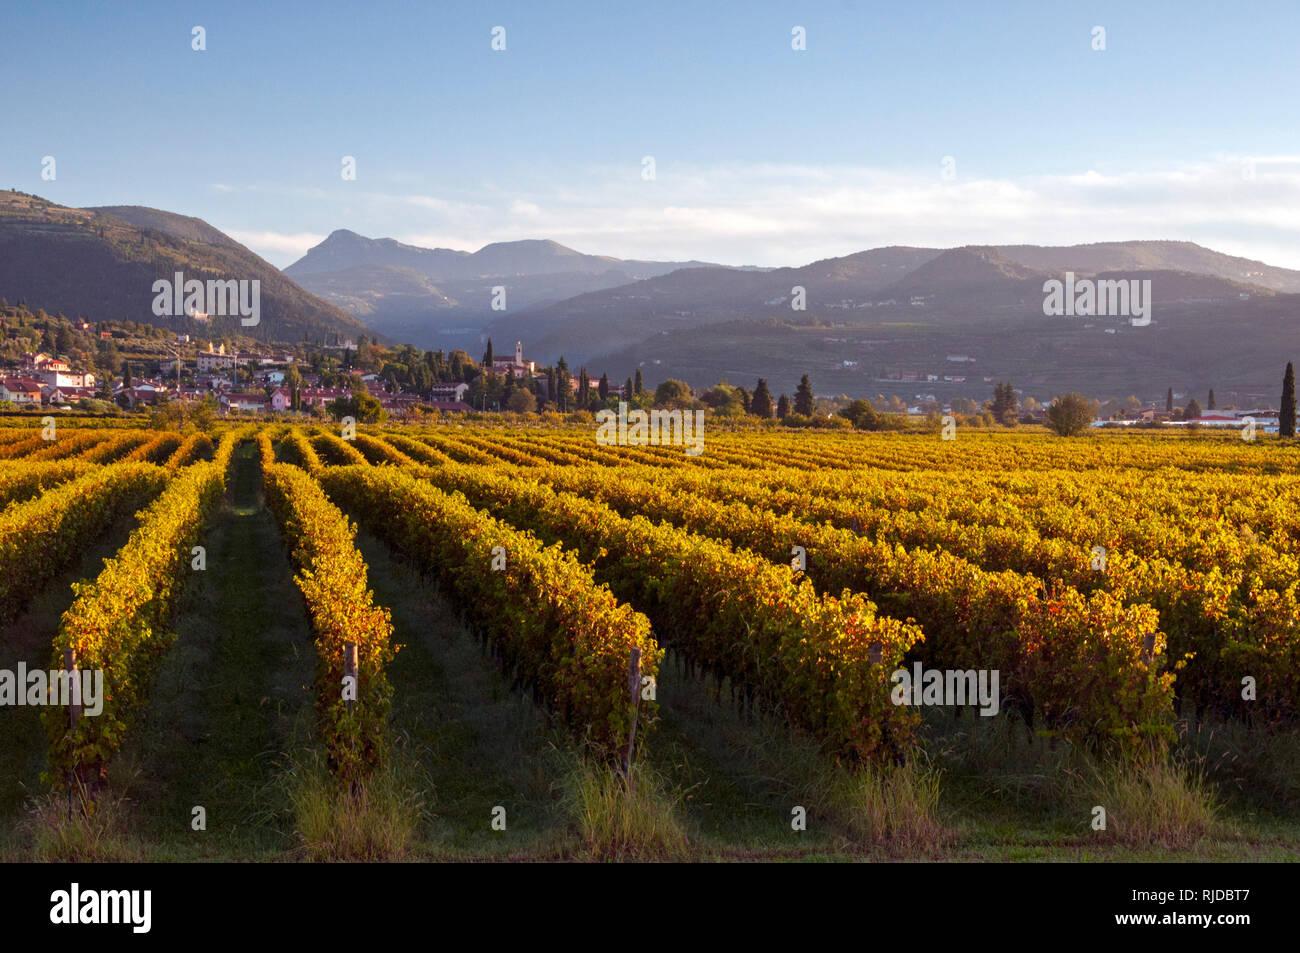 Sunrise view across vineyards from Dimora del Bugiardo, near San Pietro in Cariano, Italy Stock Photo